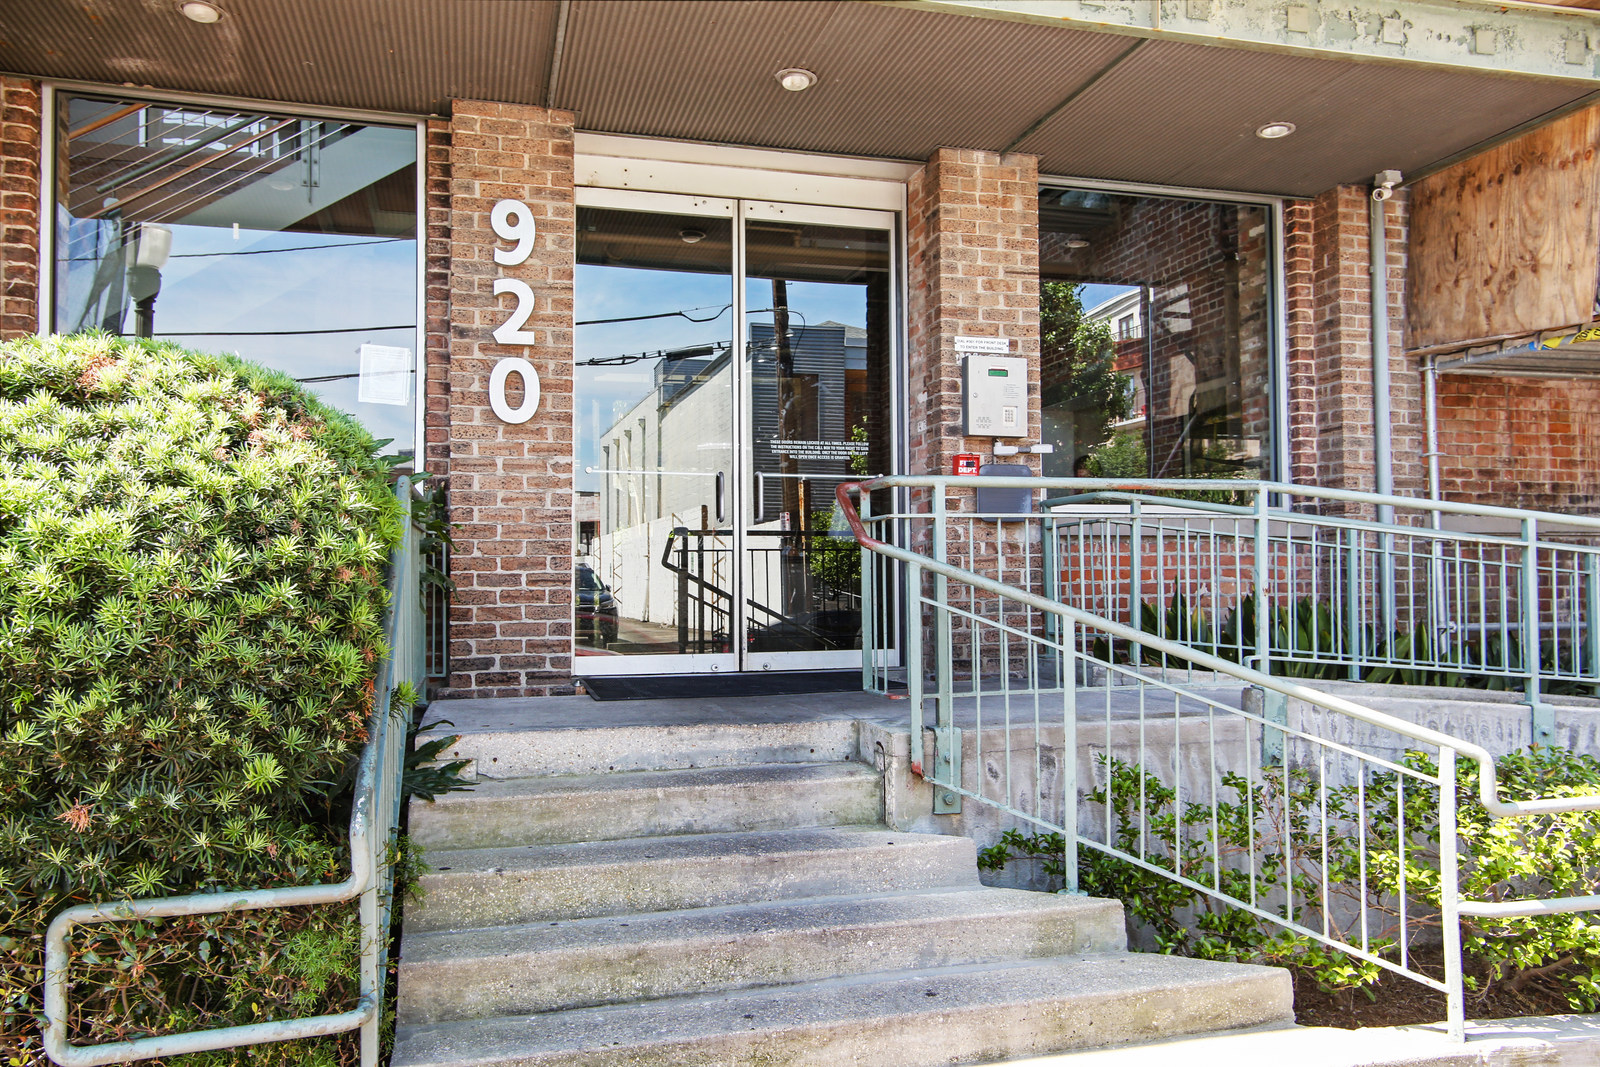 CBD/Warehouse District/South Market, Condo, 1 beds, 1.0 baths, $2800 per month New Orleans Rental - devie image_14